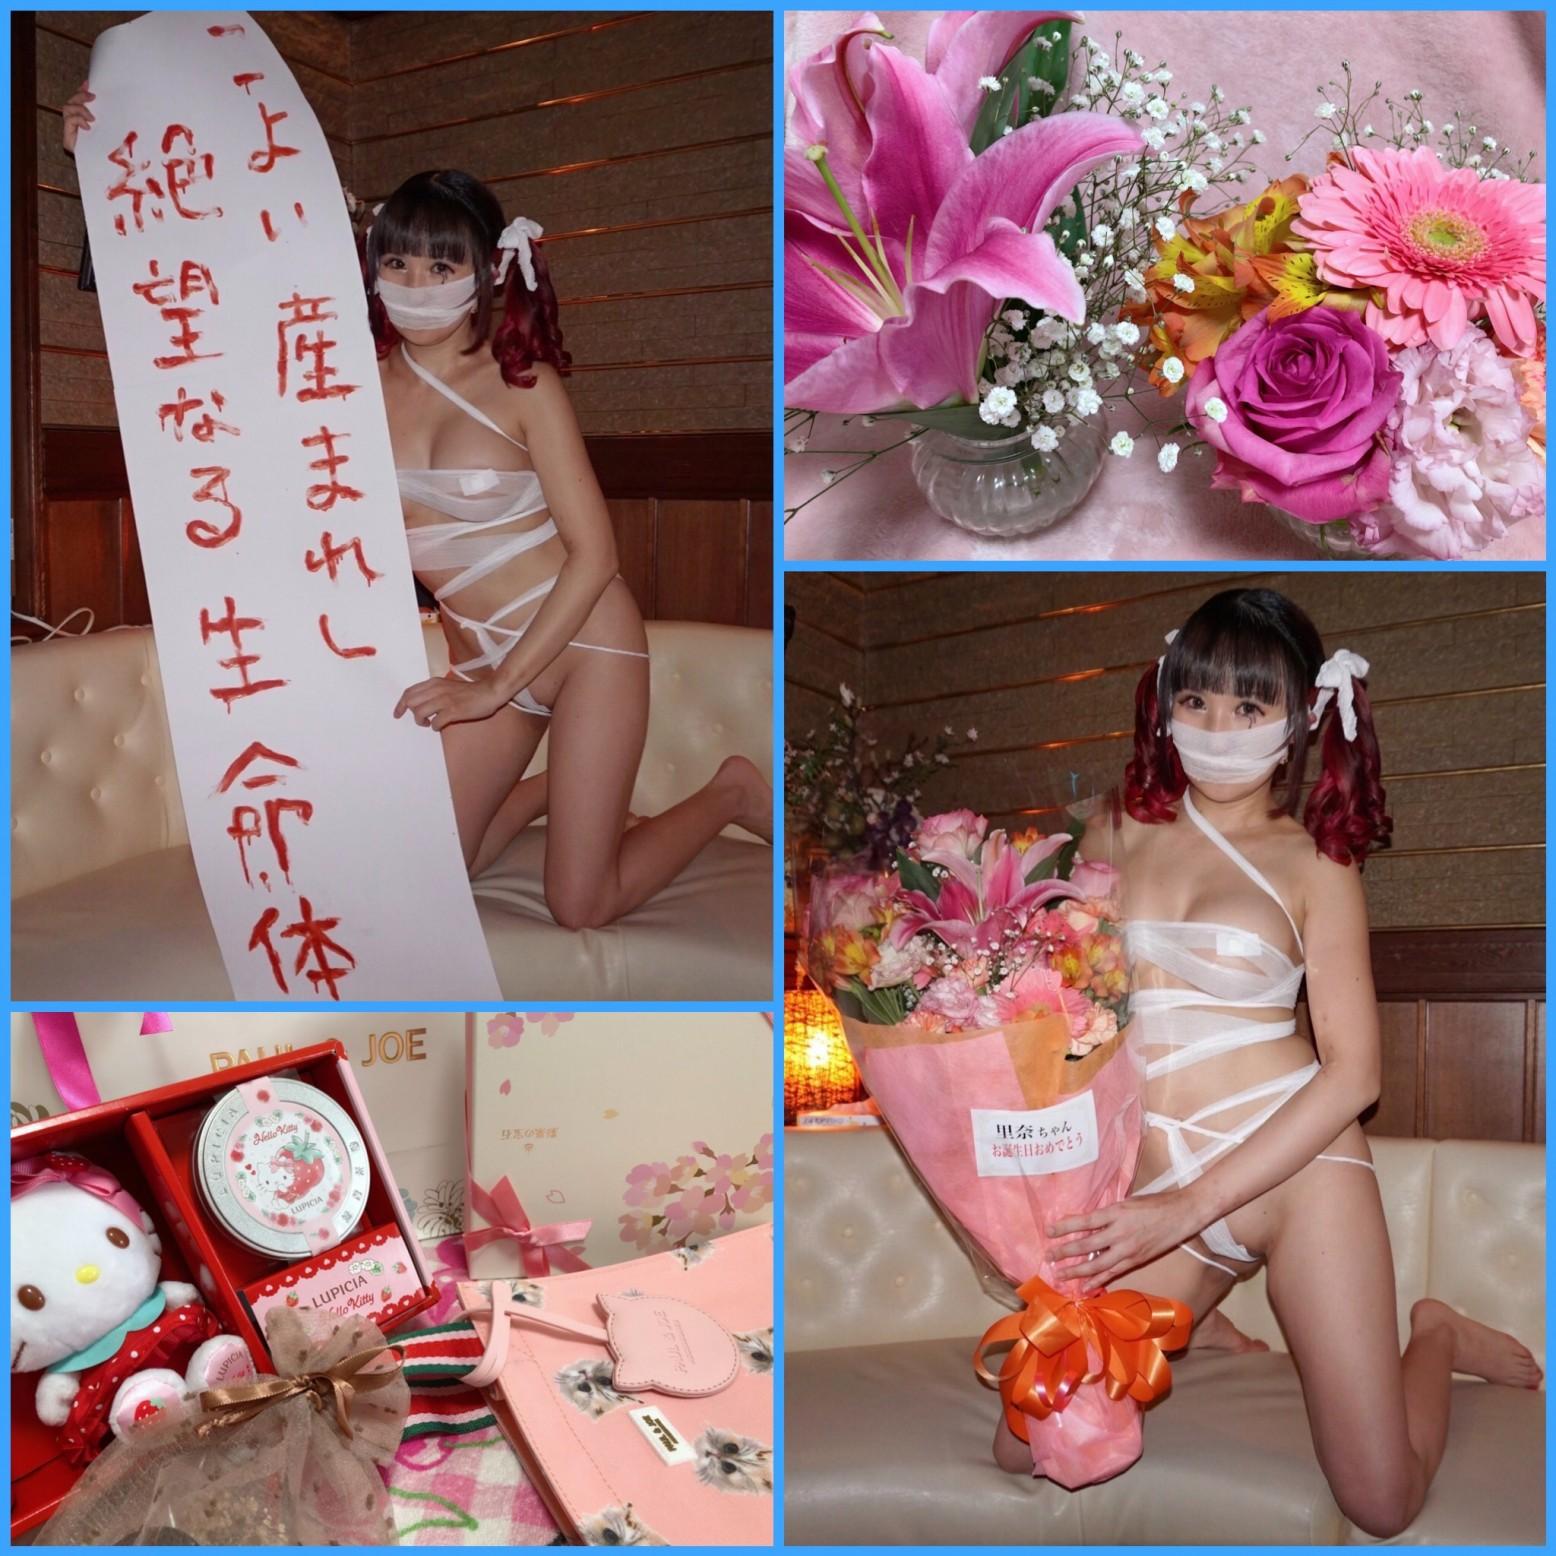 moblog_c0953560.jpg